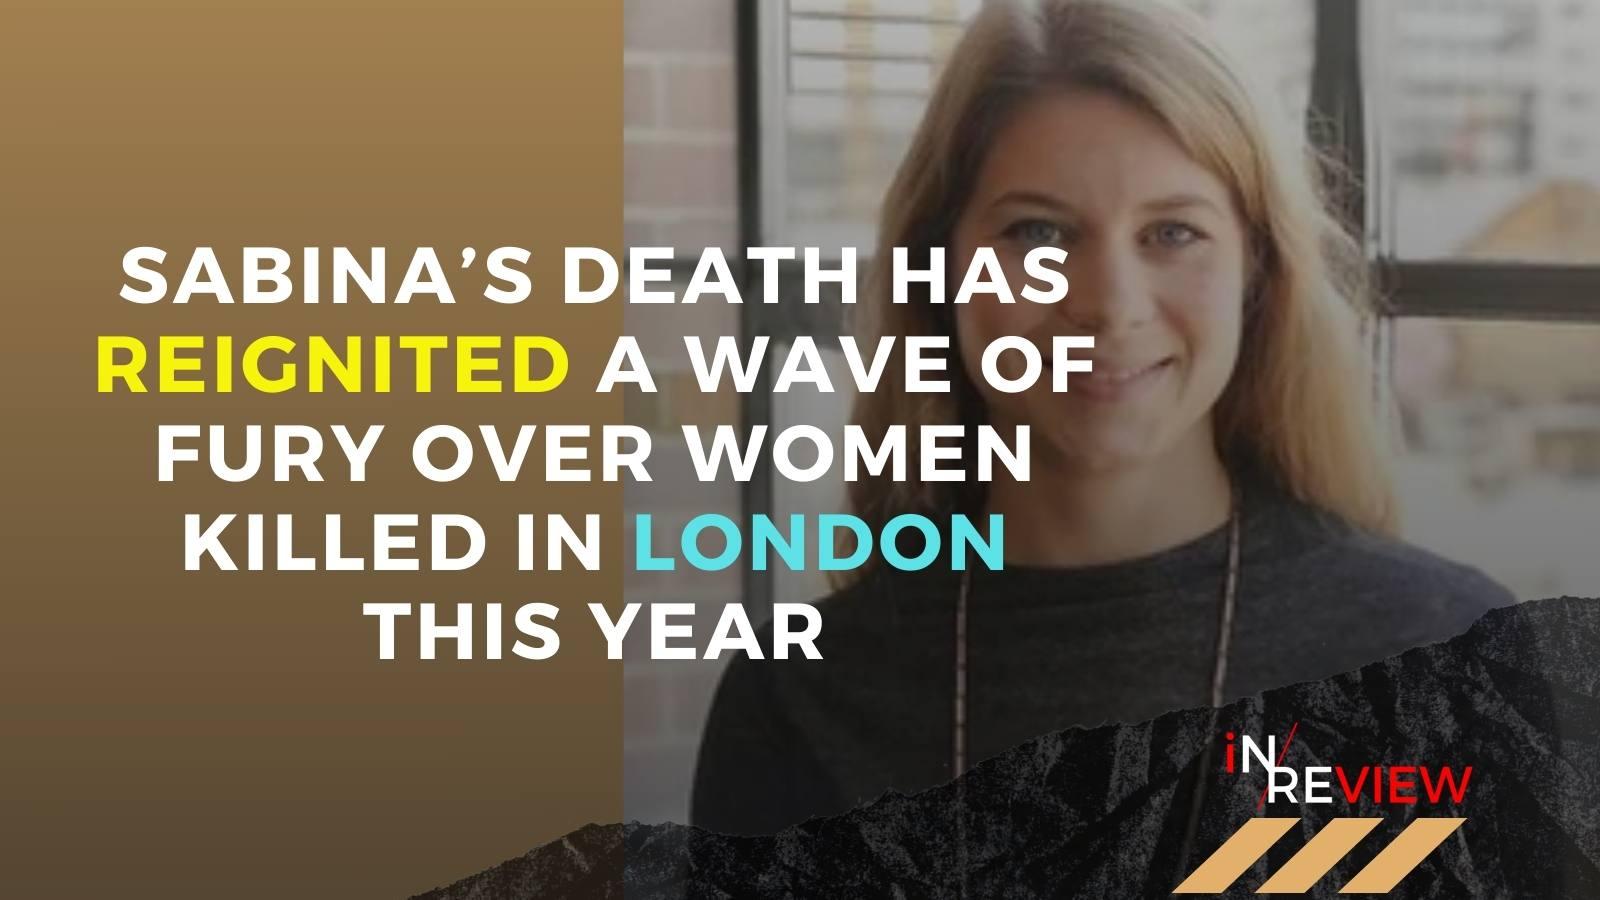 School teacher murdered Sabina Nessa Sarah Everard London murder